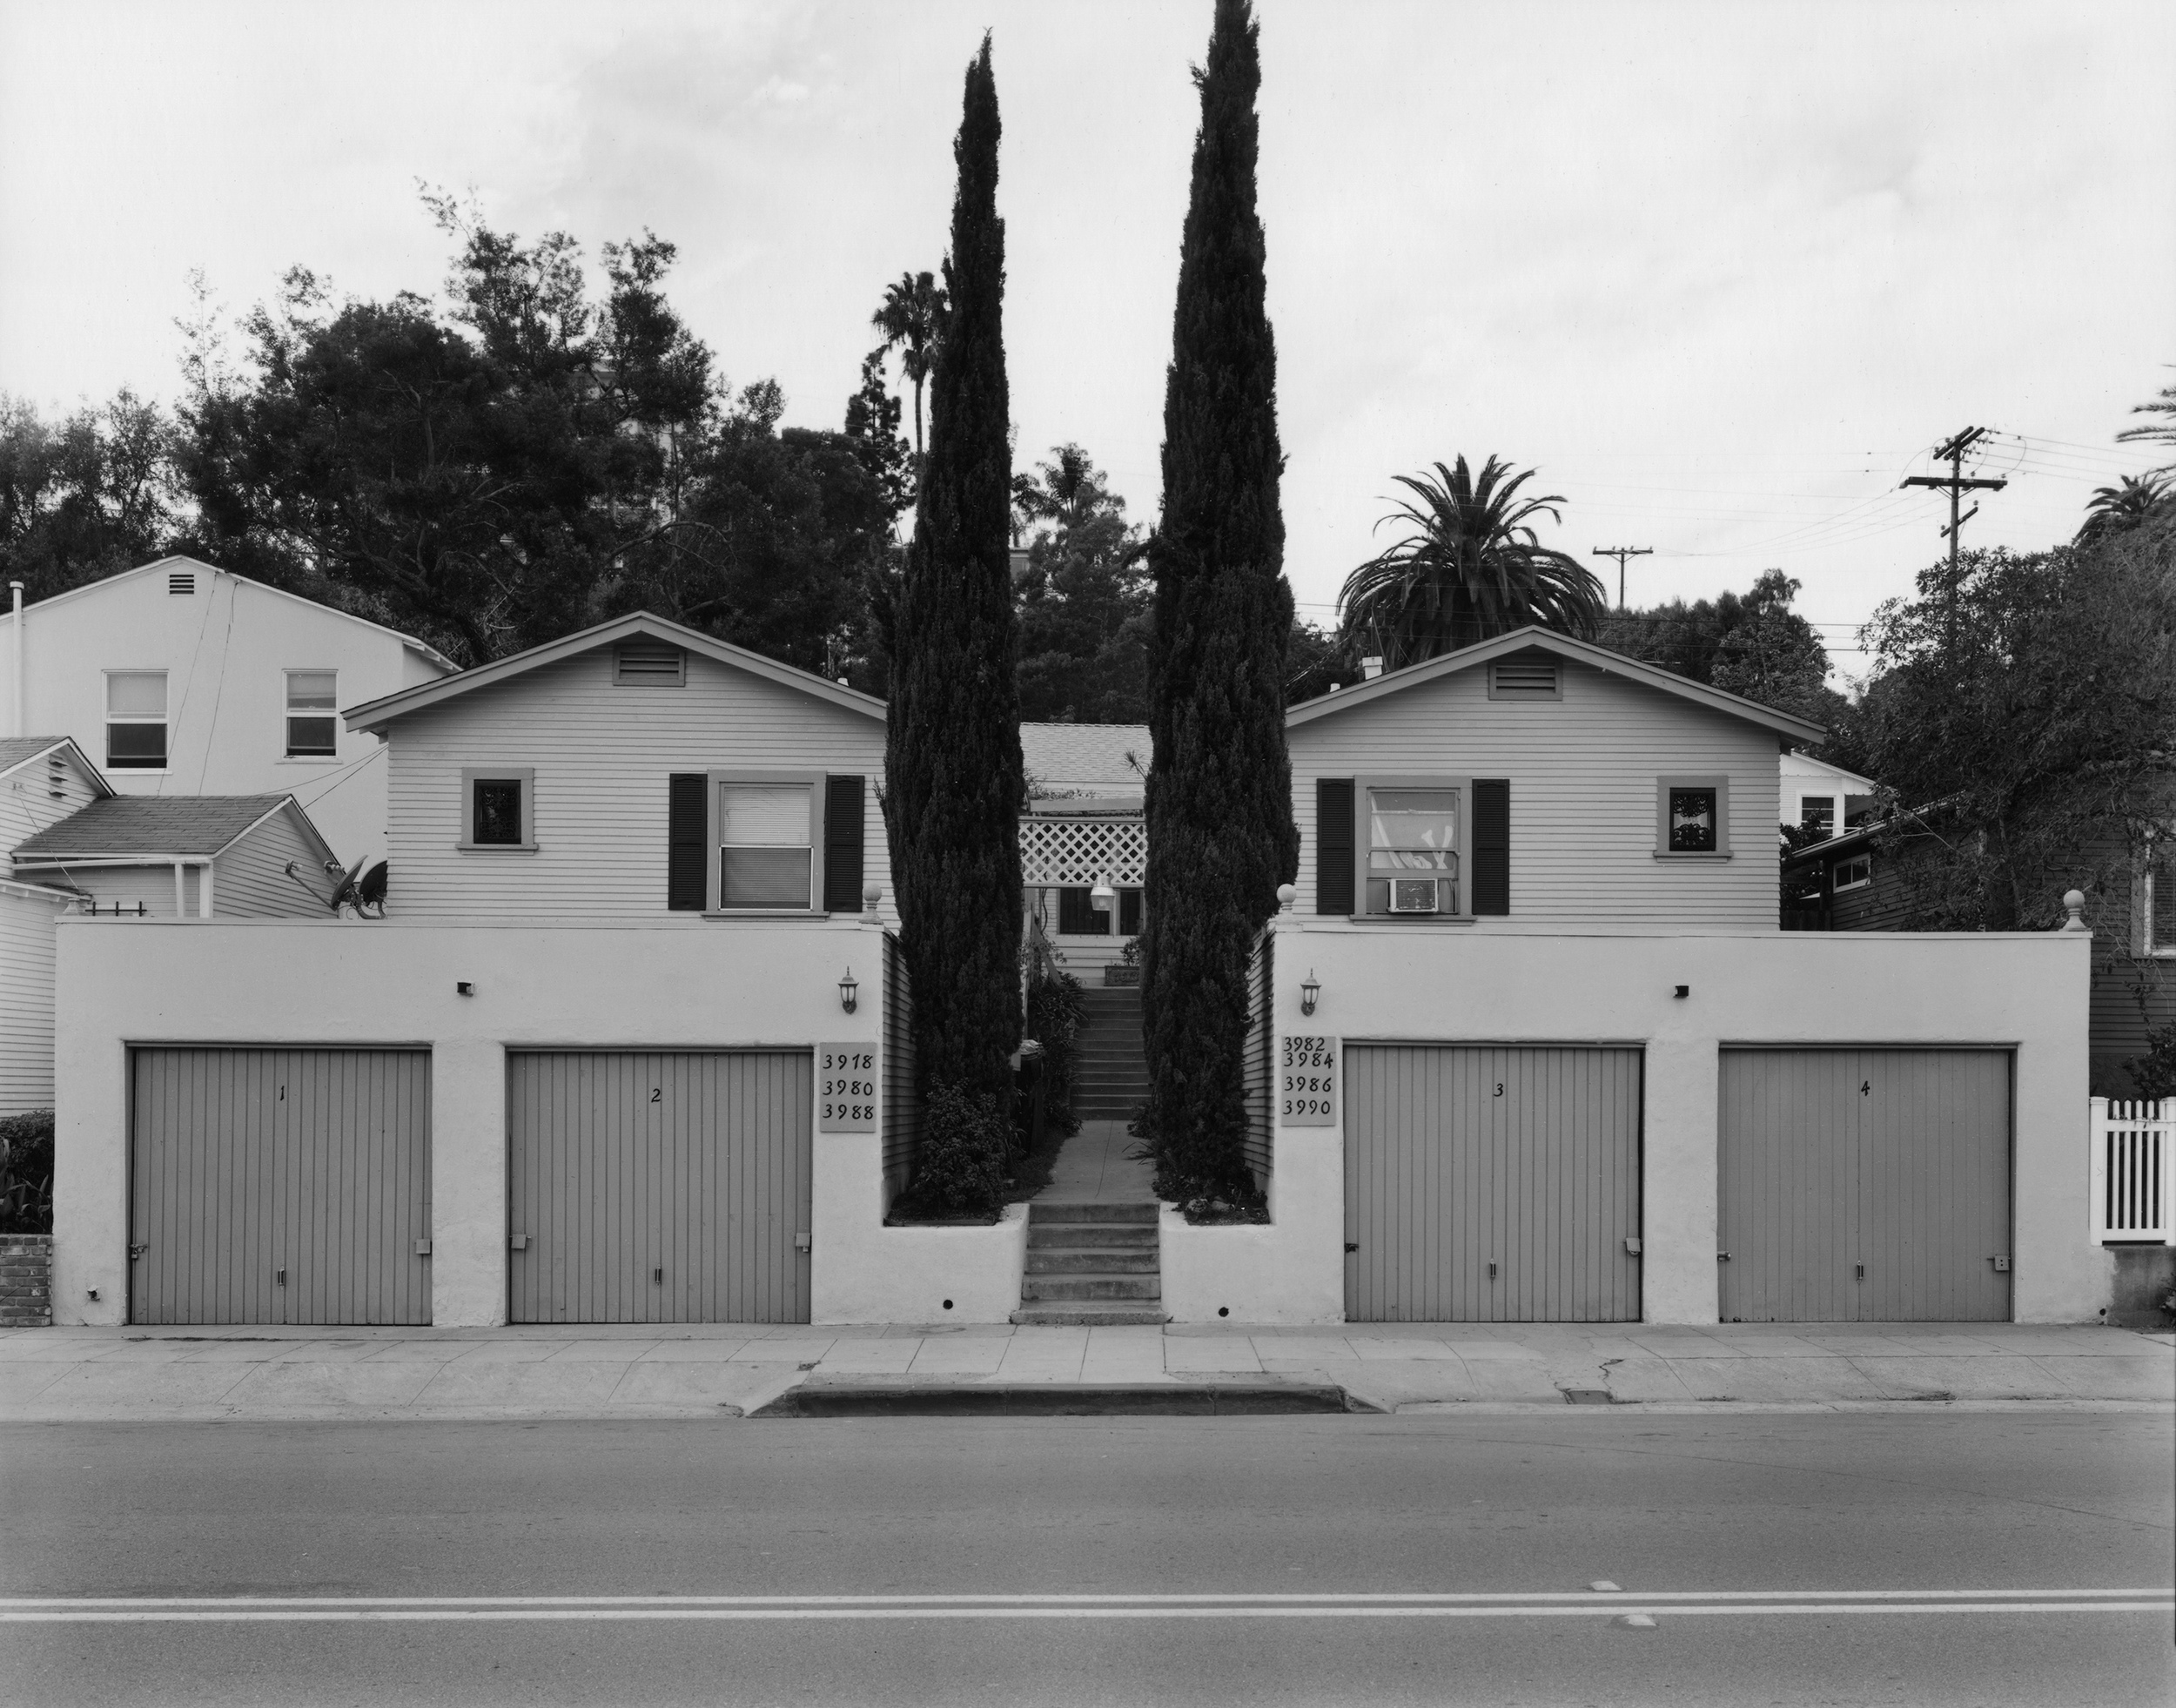 Michael Mulno, Mutil-Unit Residence Florida Street, University Heights, San Diego, CA 2014 gelatin silver contact print 8 x 10 inches